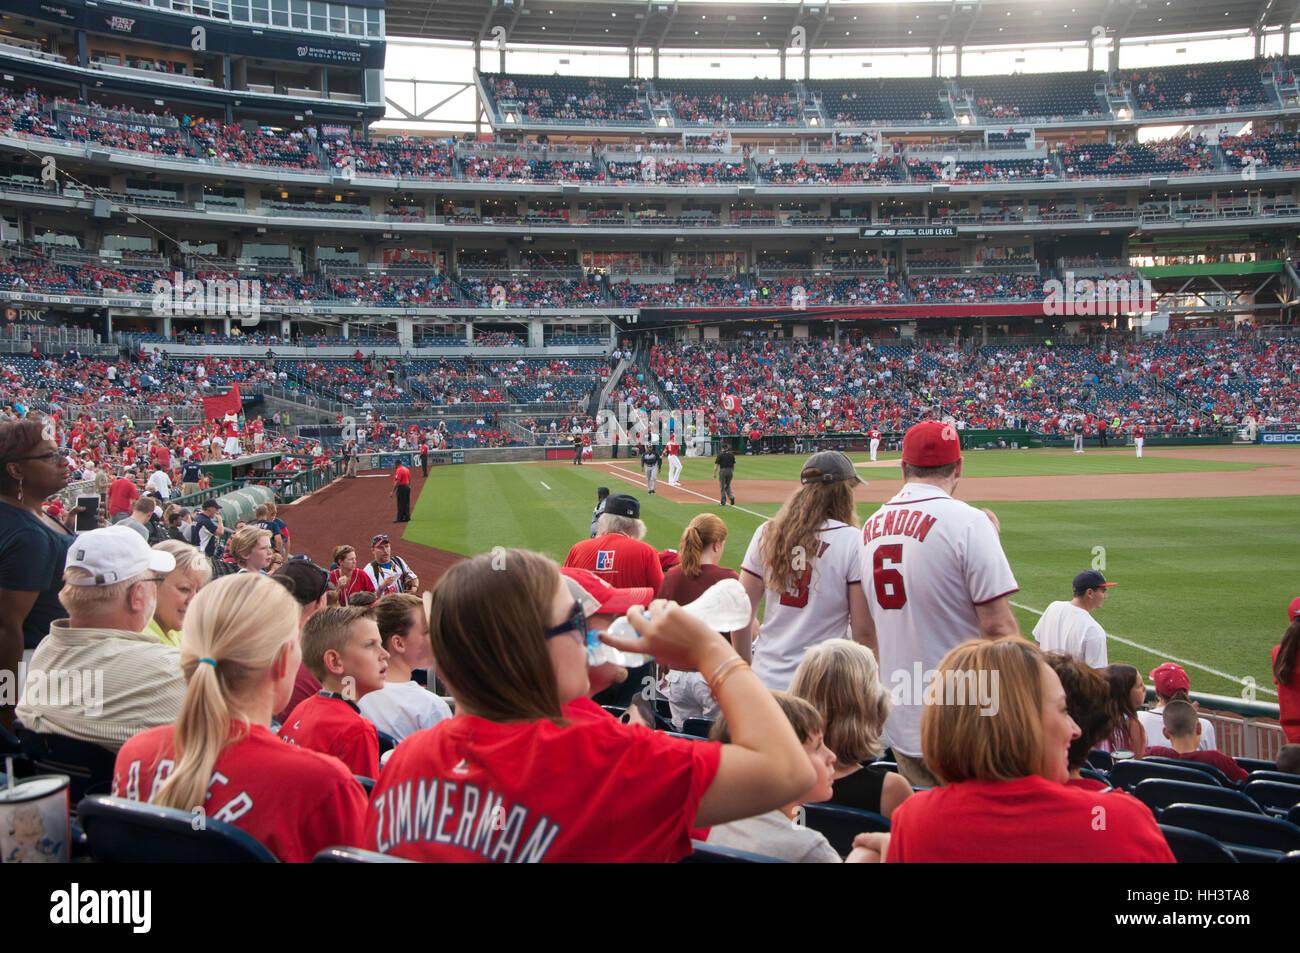 Fans at the Washington Nationals Ball Park in Washington, DC. Stock Photo